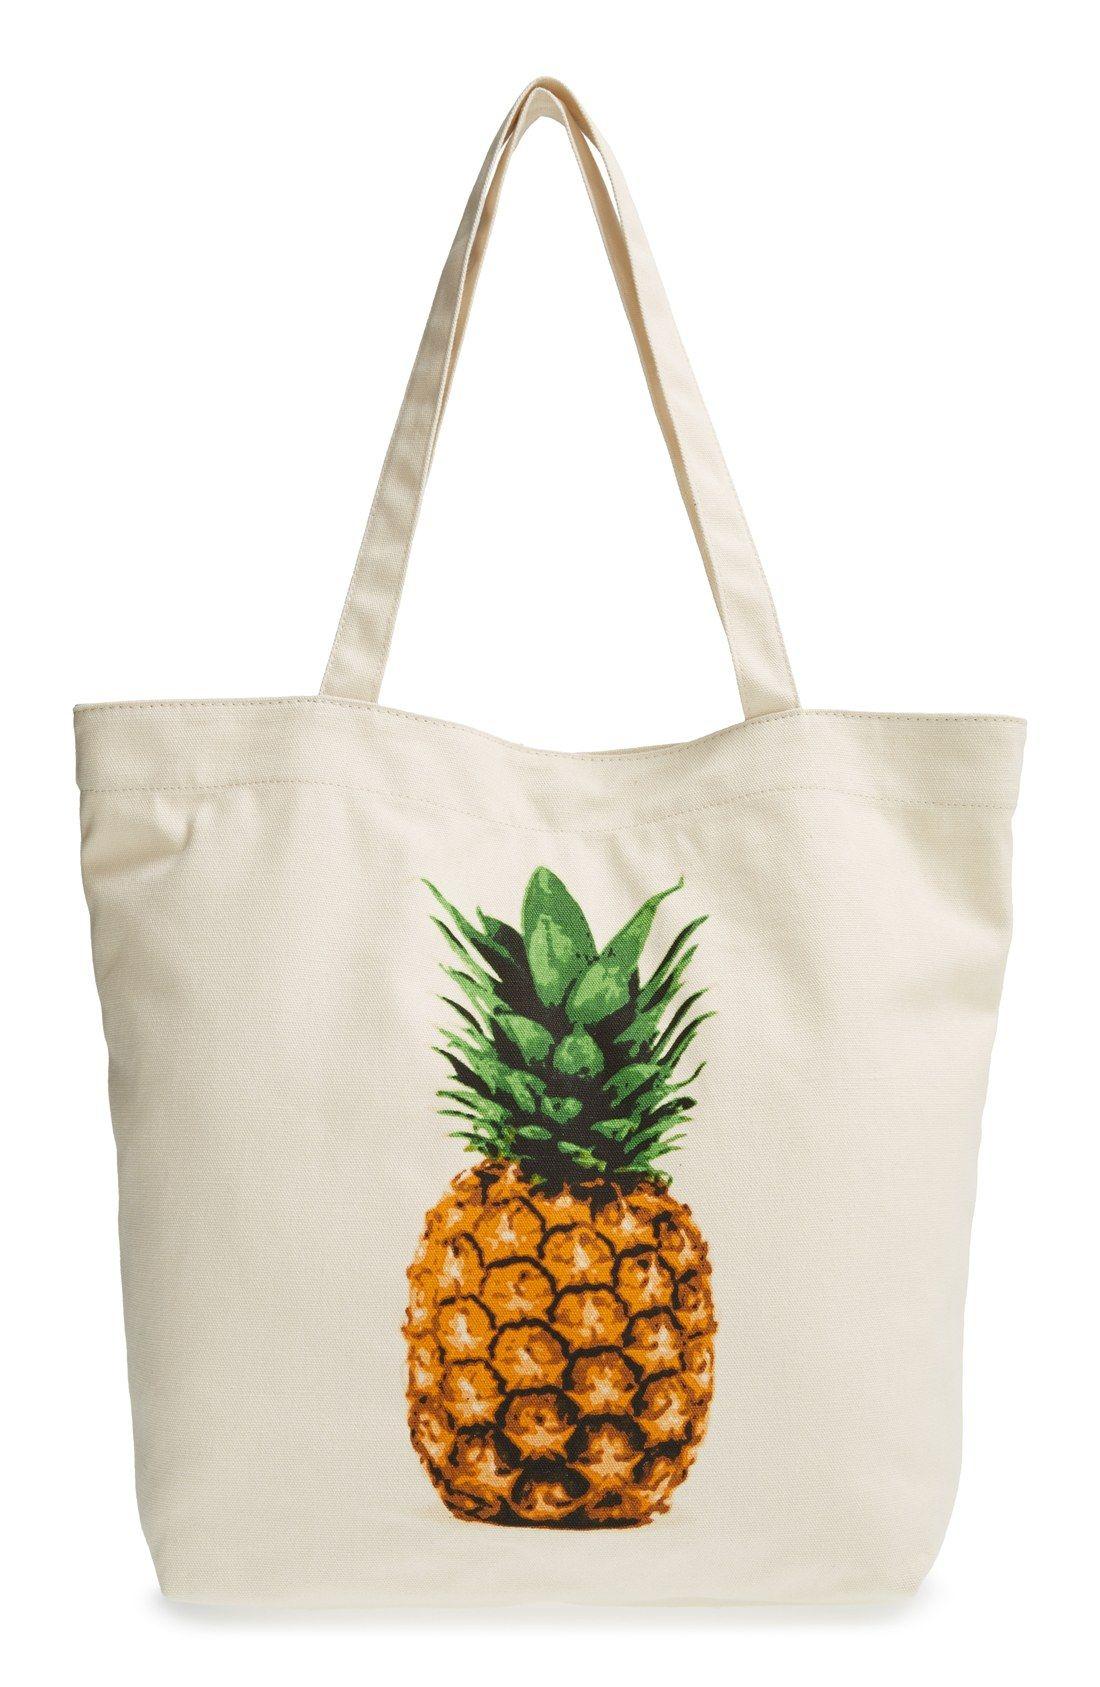 Tote Bag - Pretty Pineapple II by VIDA VIDA V7Iu04LVX